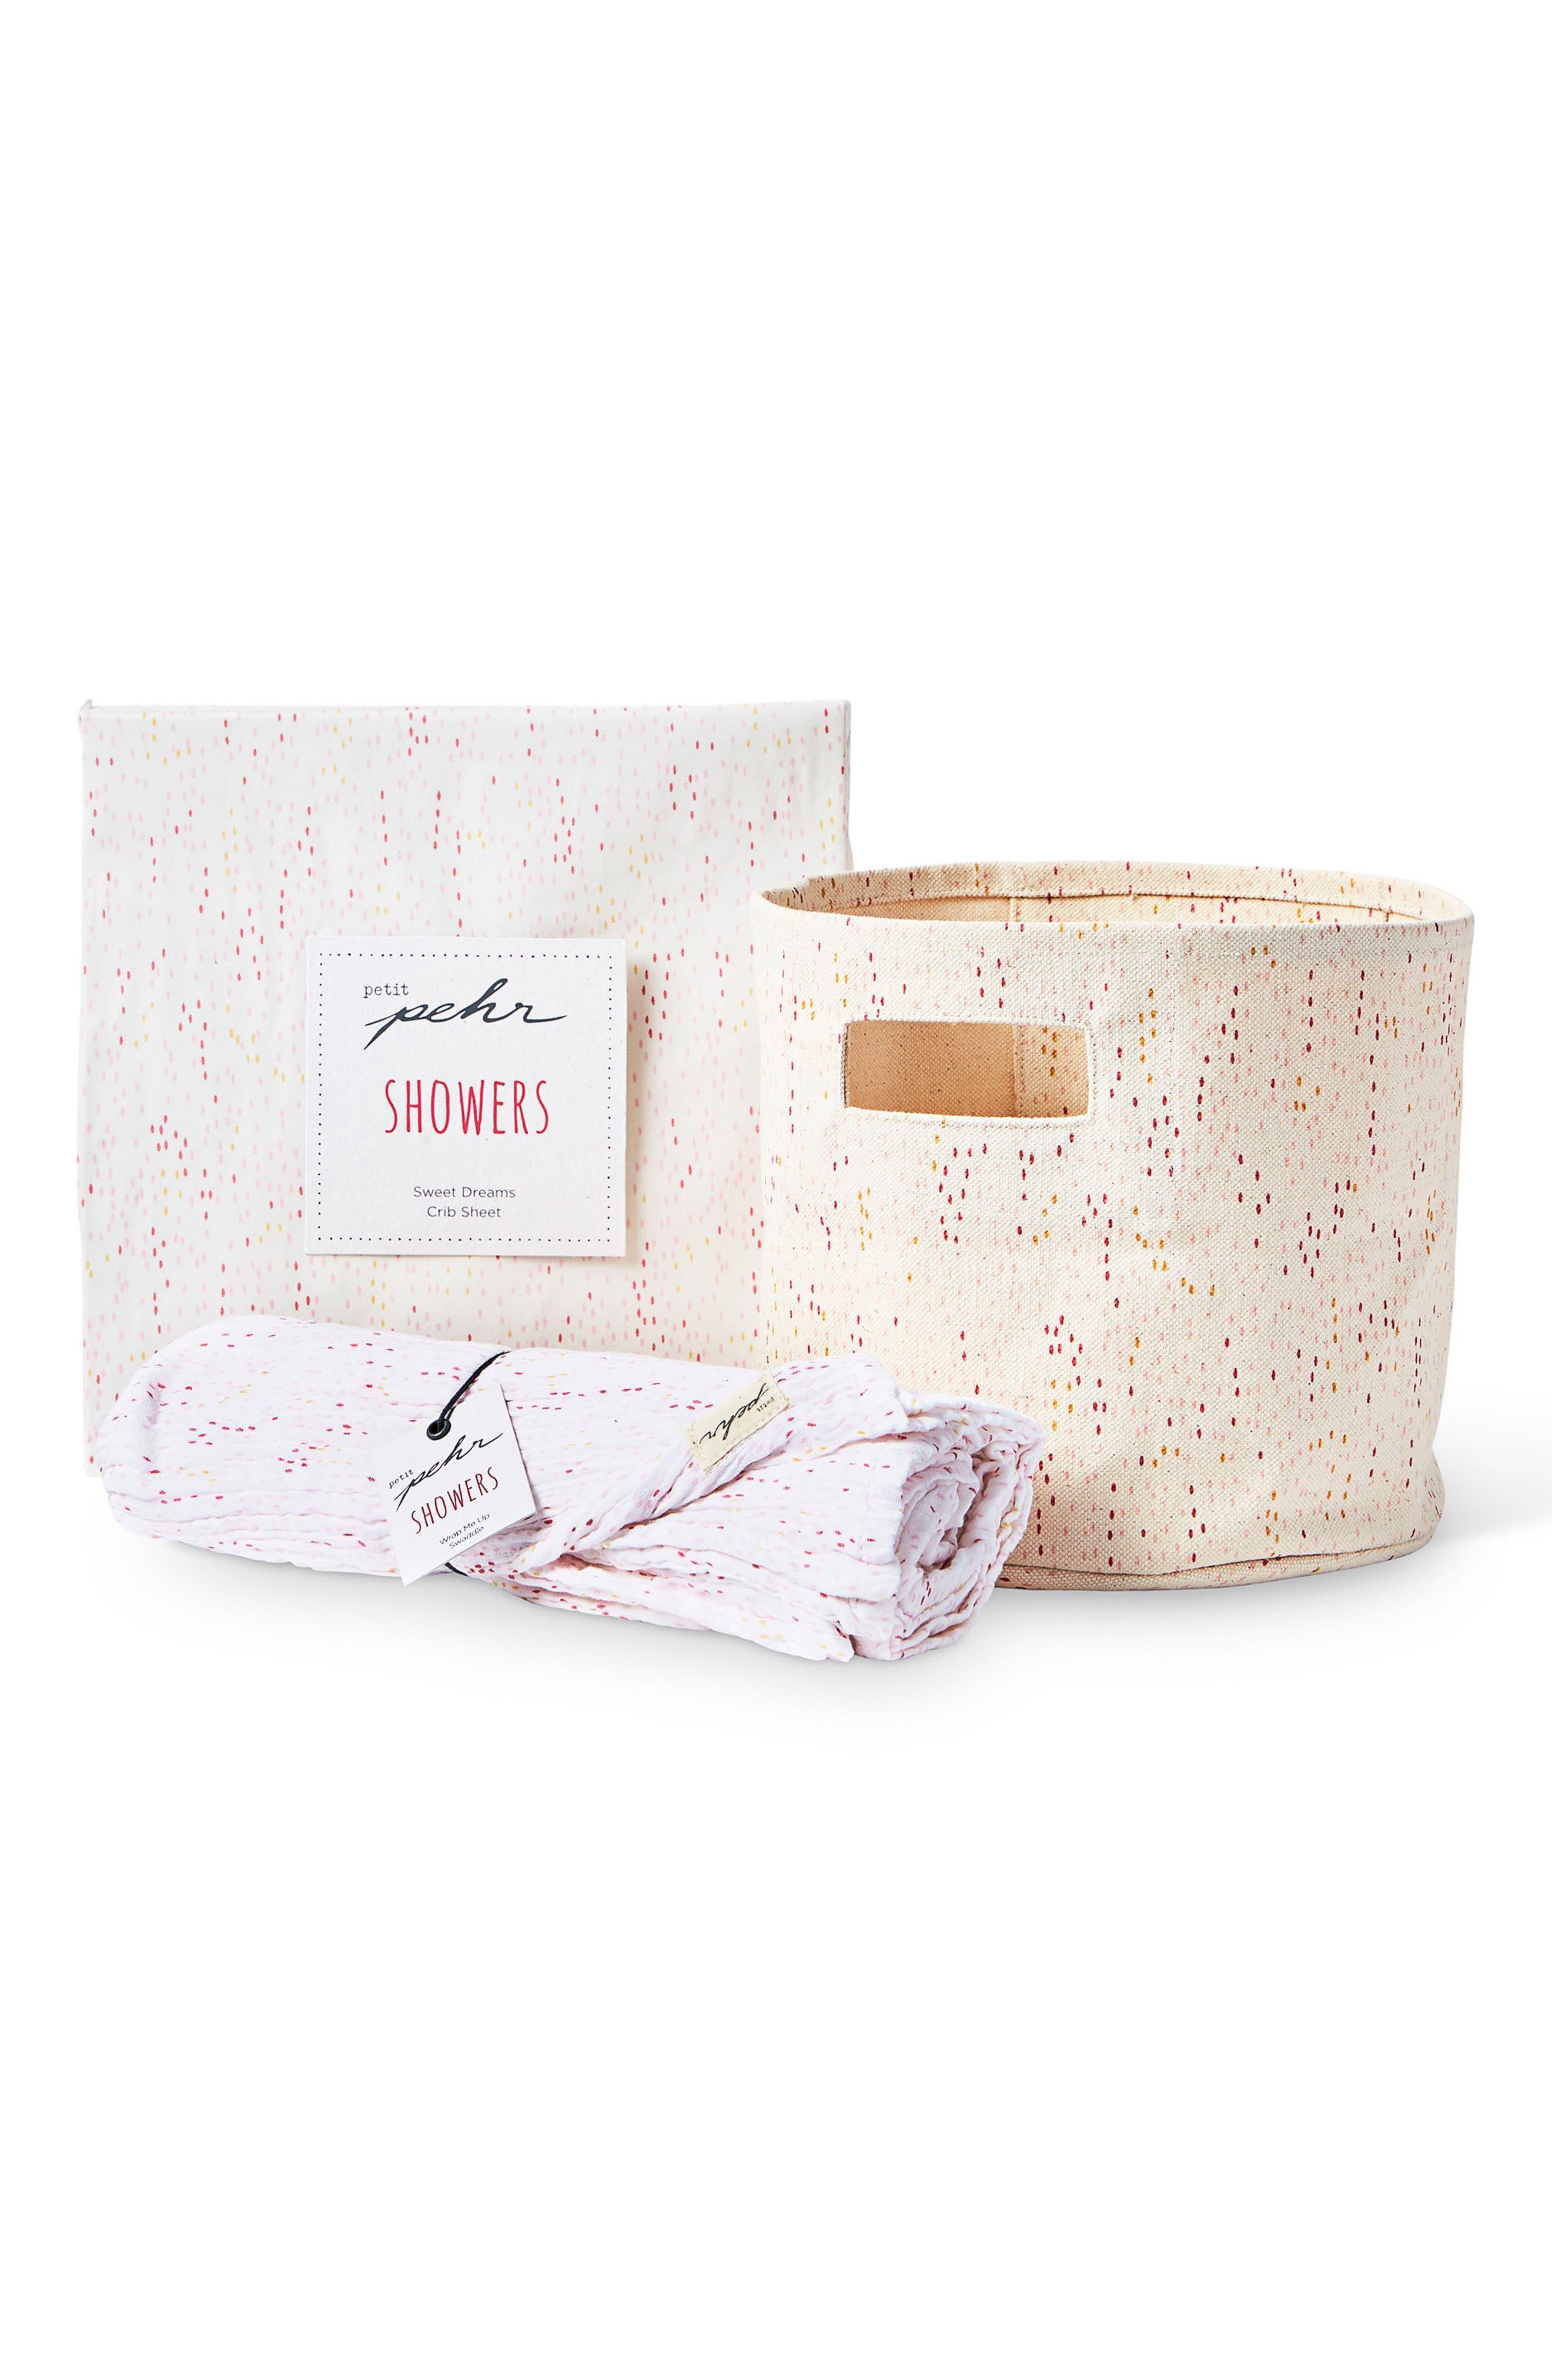 Showers Crib Sheet, Swaddle & Mini Canvas Bin Set,                             Main thumbnail 1, color,                             650